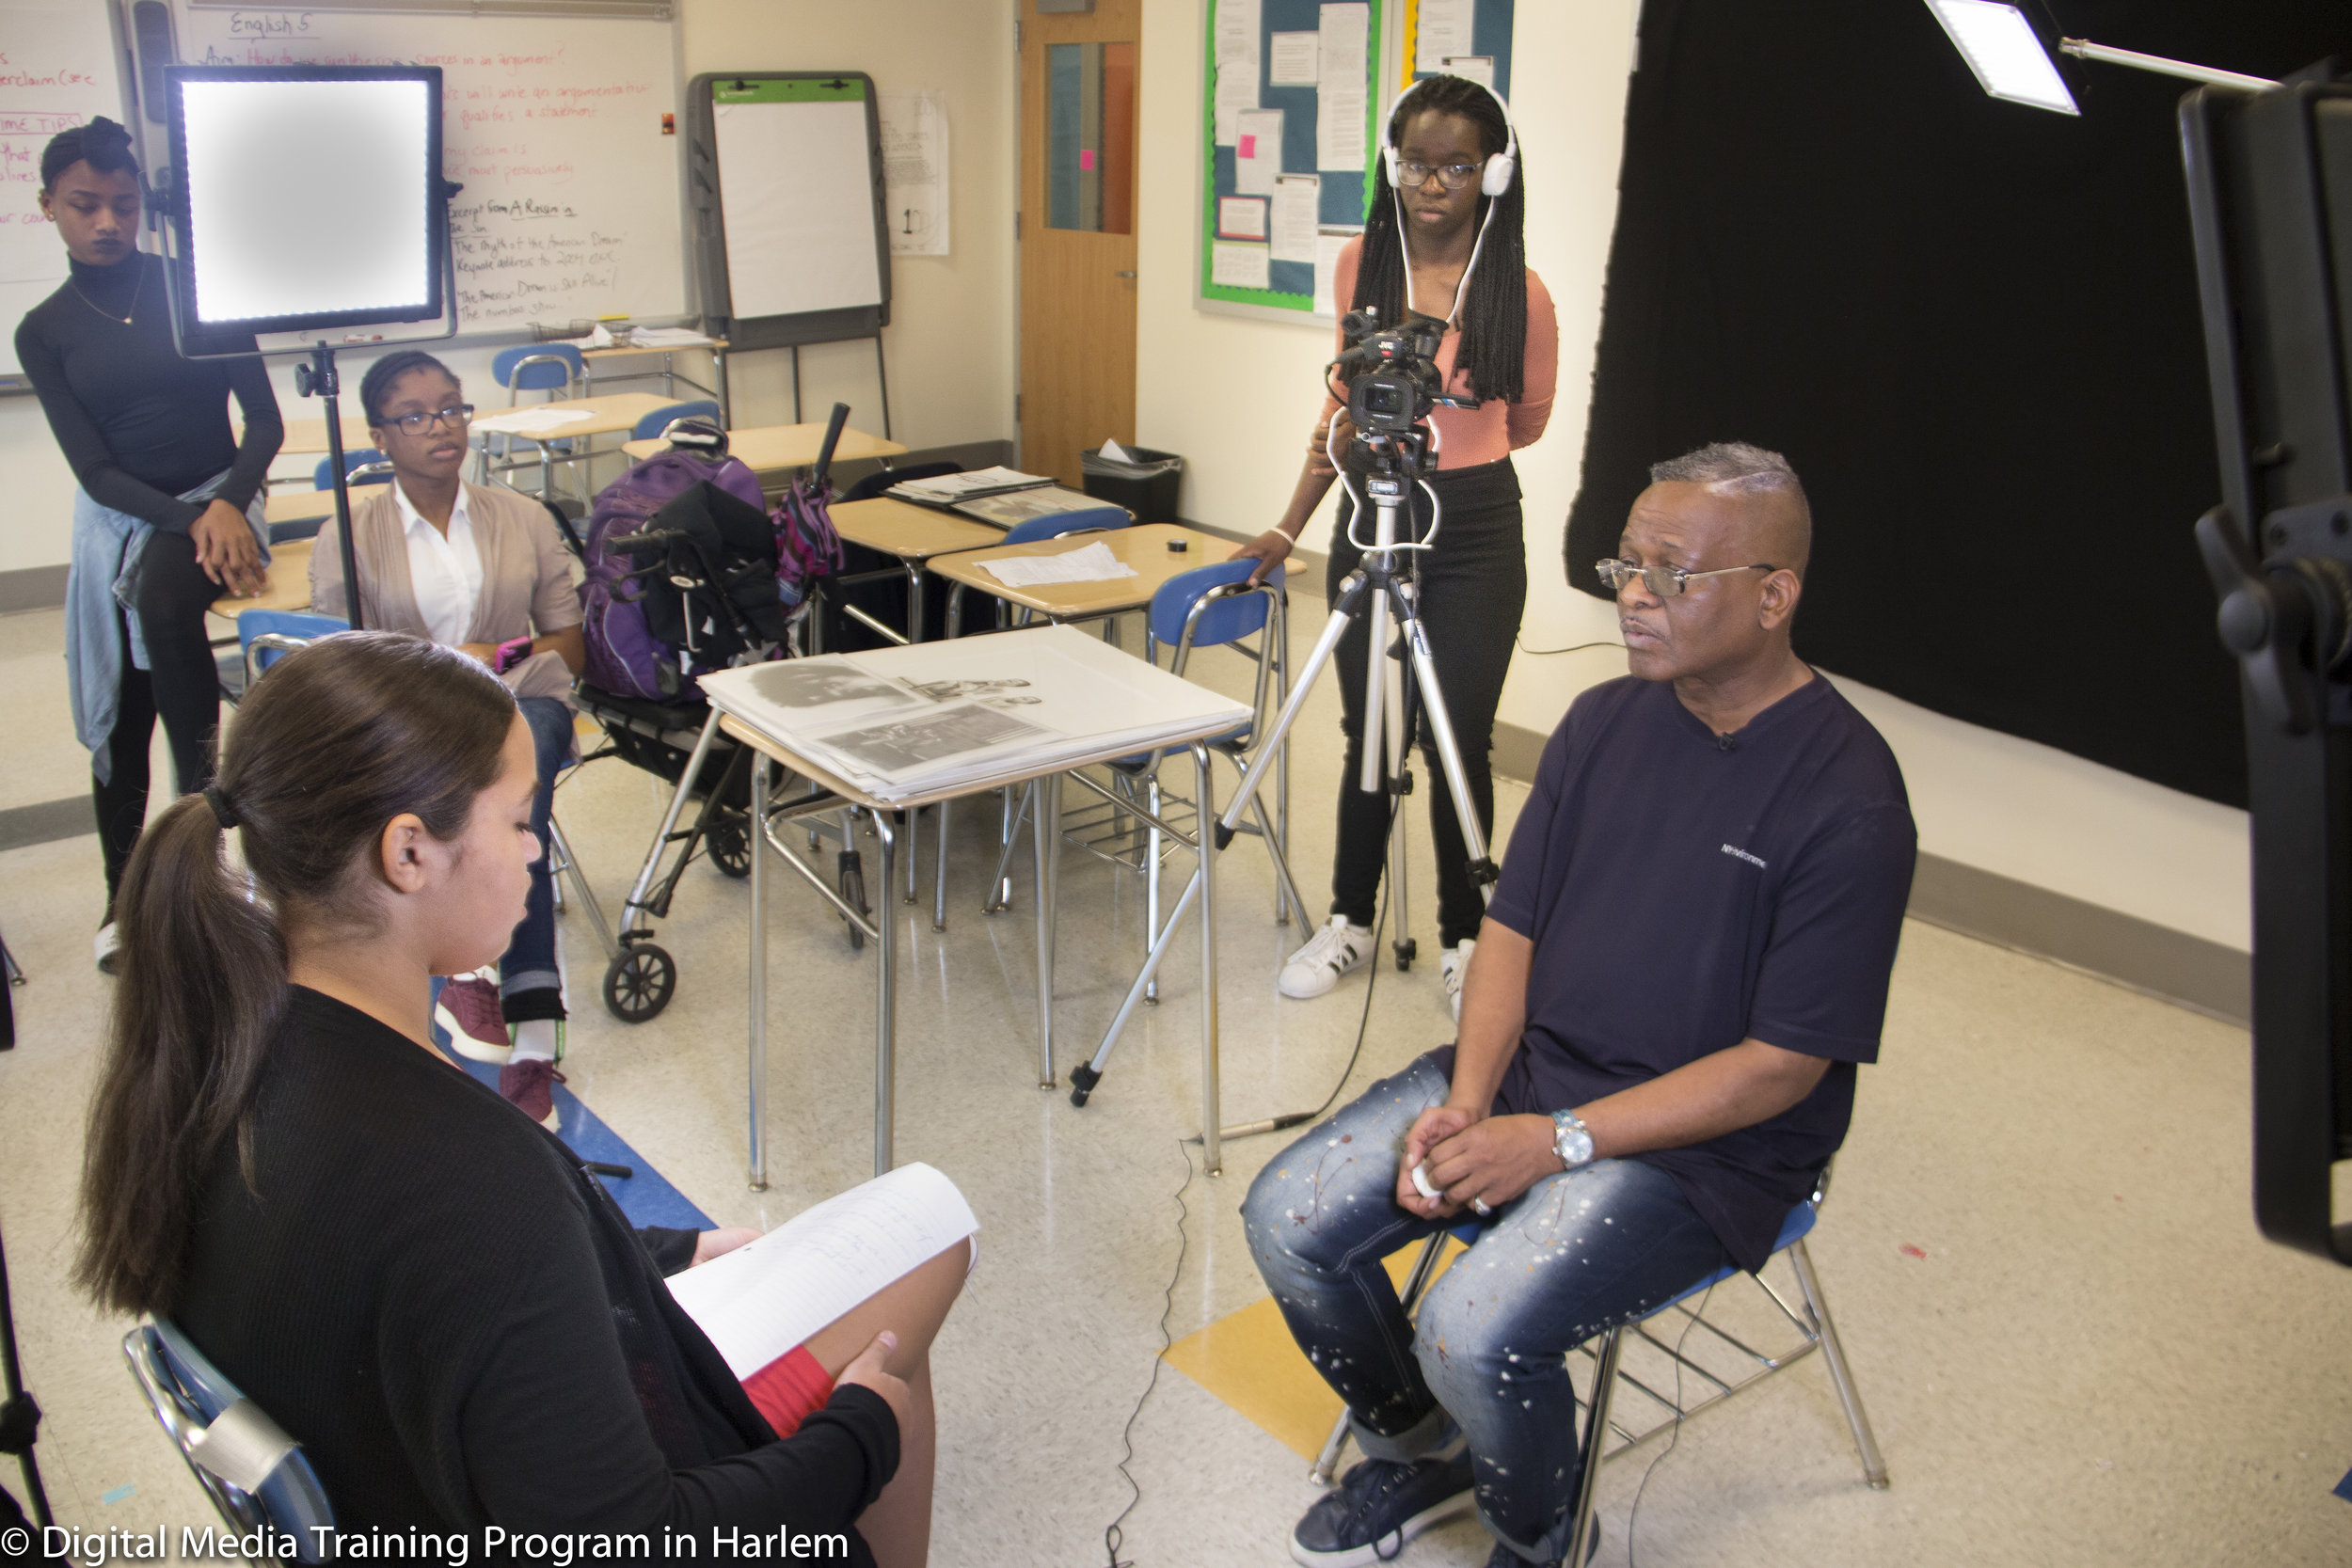 Artist Guy Woodard being interviewed at New Explorers High School